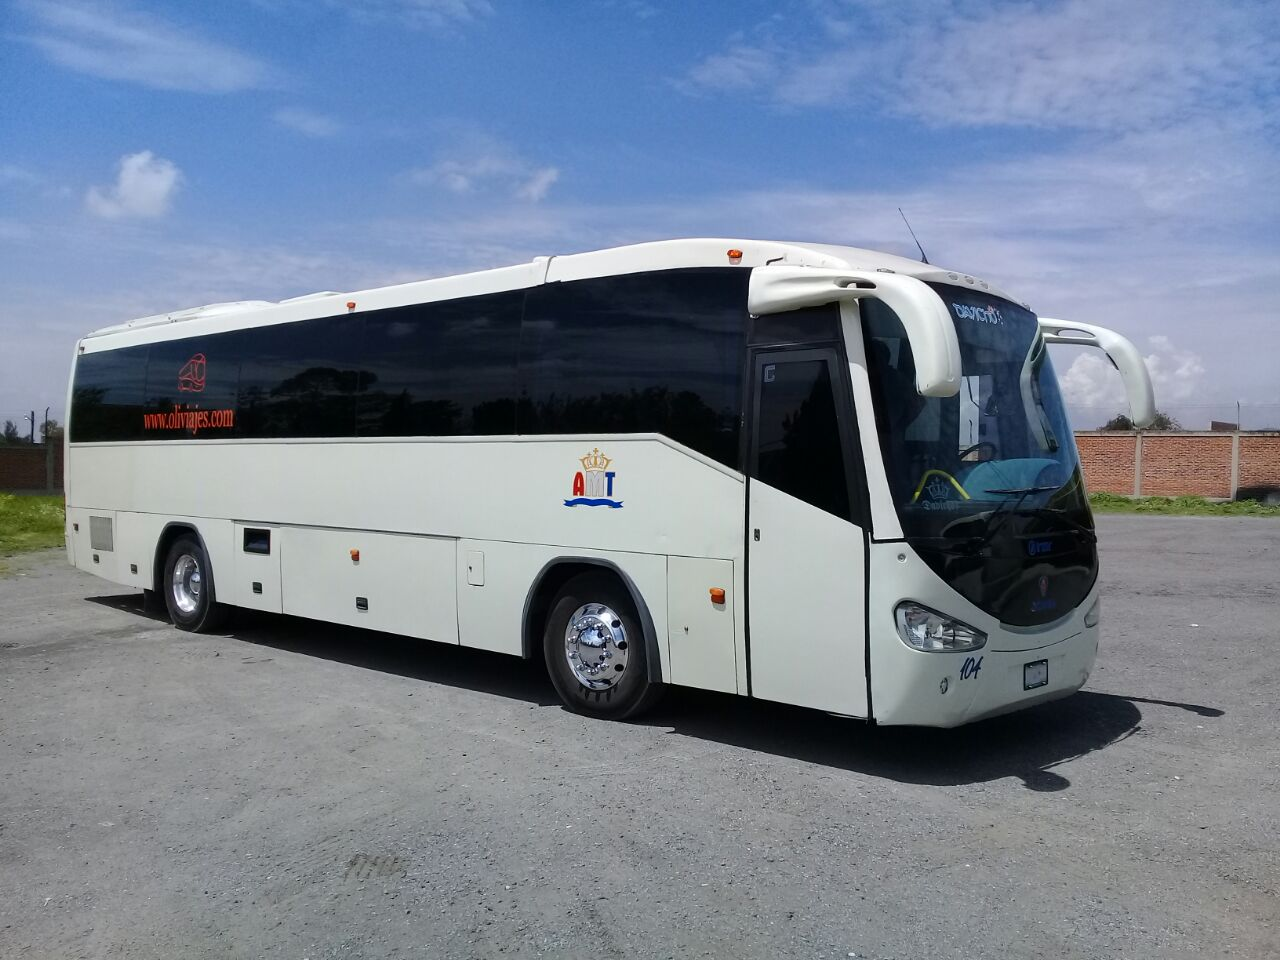 Oliviajes, Renta de autobuses de turismo